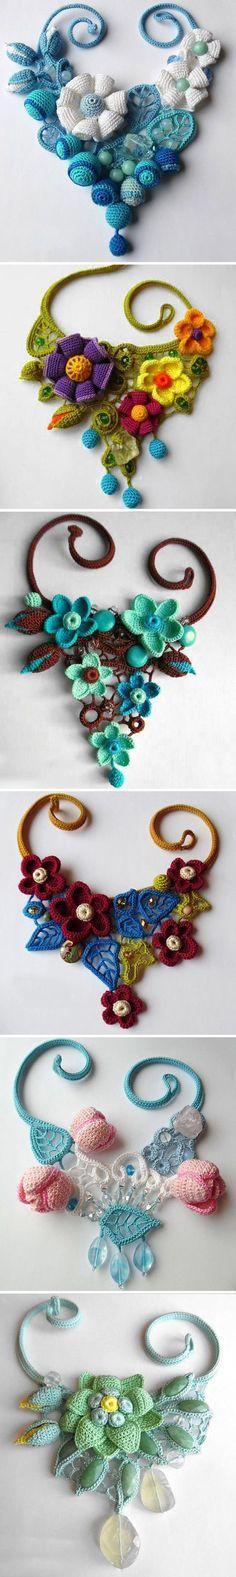 Russian artist Tatiana Potemkina makes wonderful crochet jewelry pieces